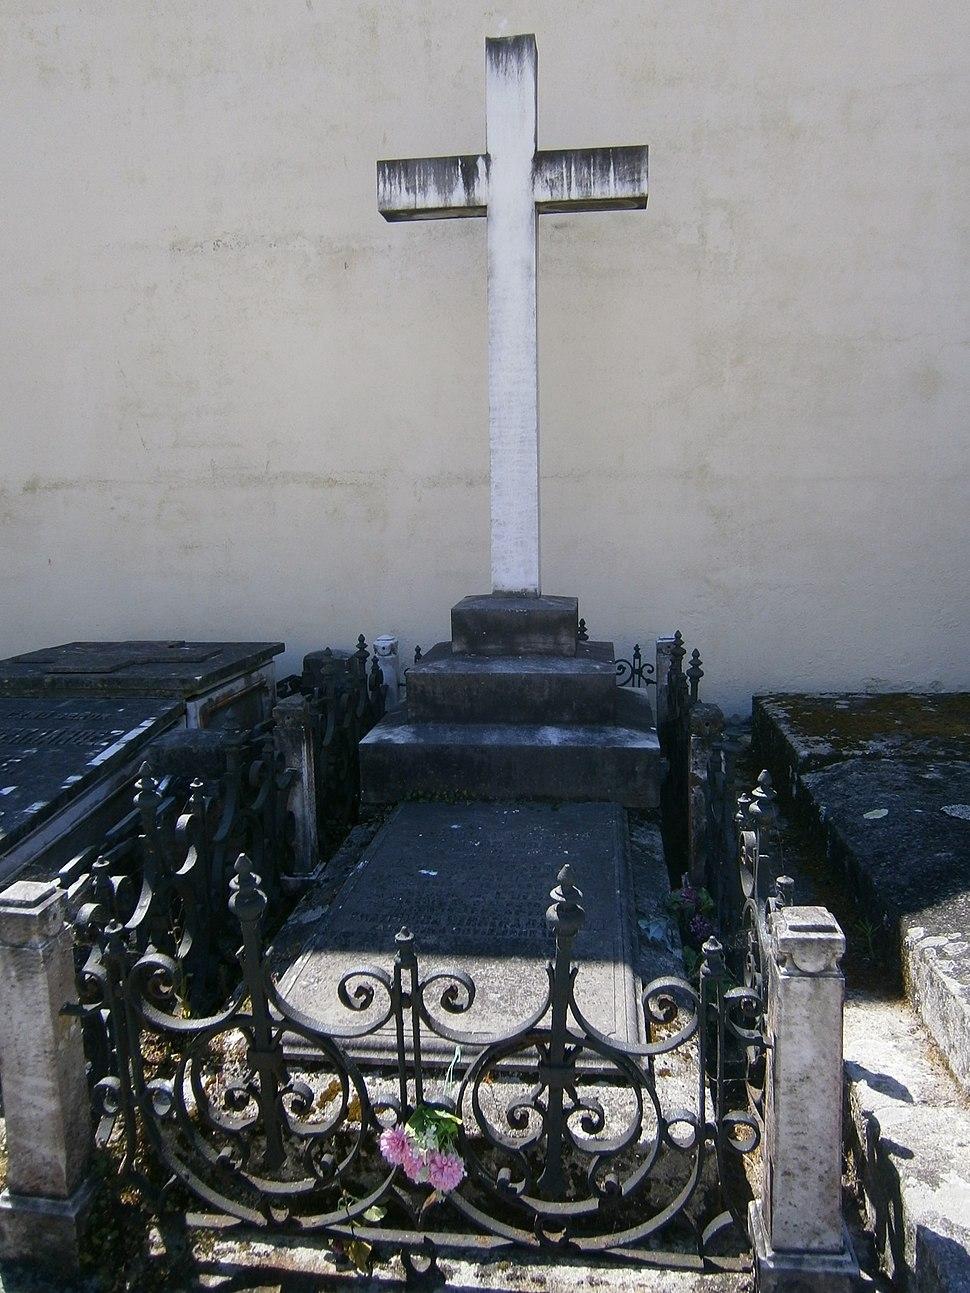 Tumba no cemiterio de S. Amaro.